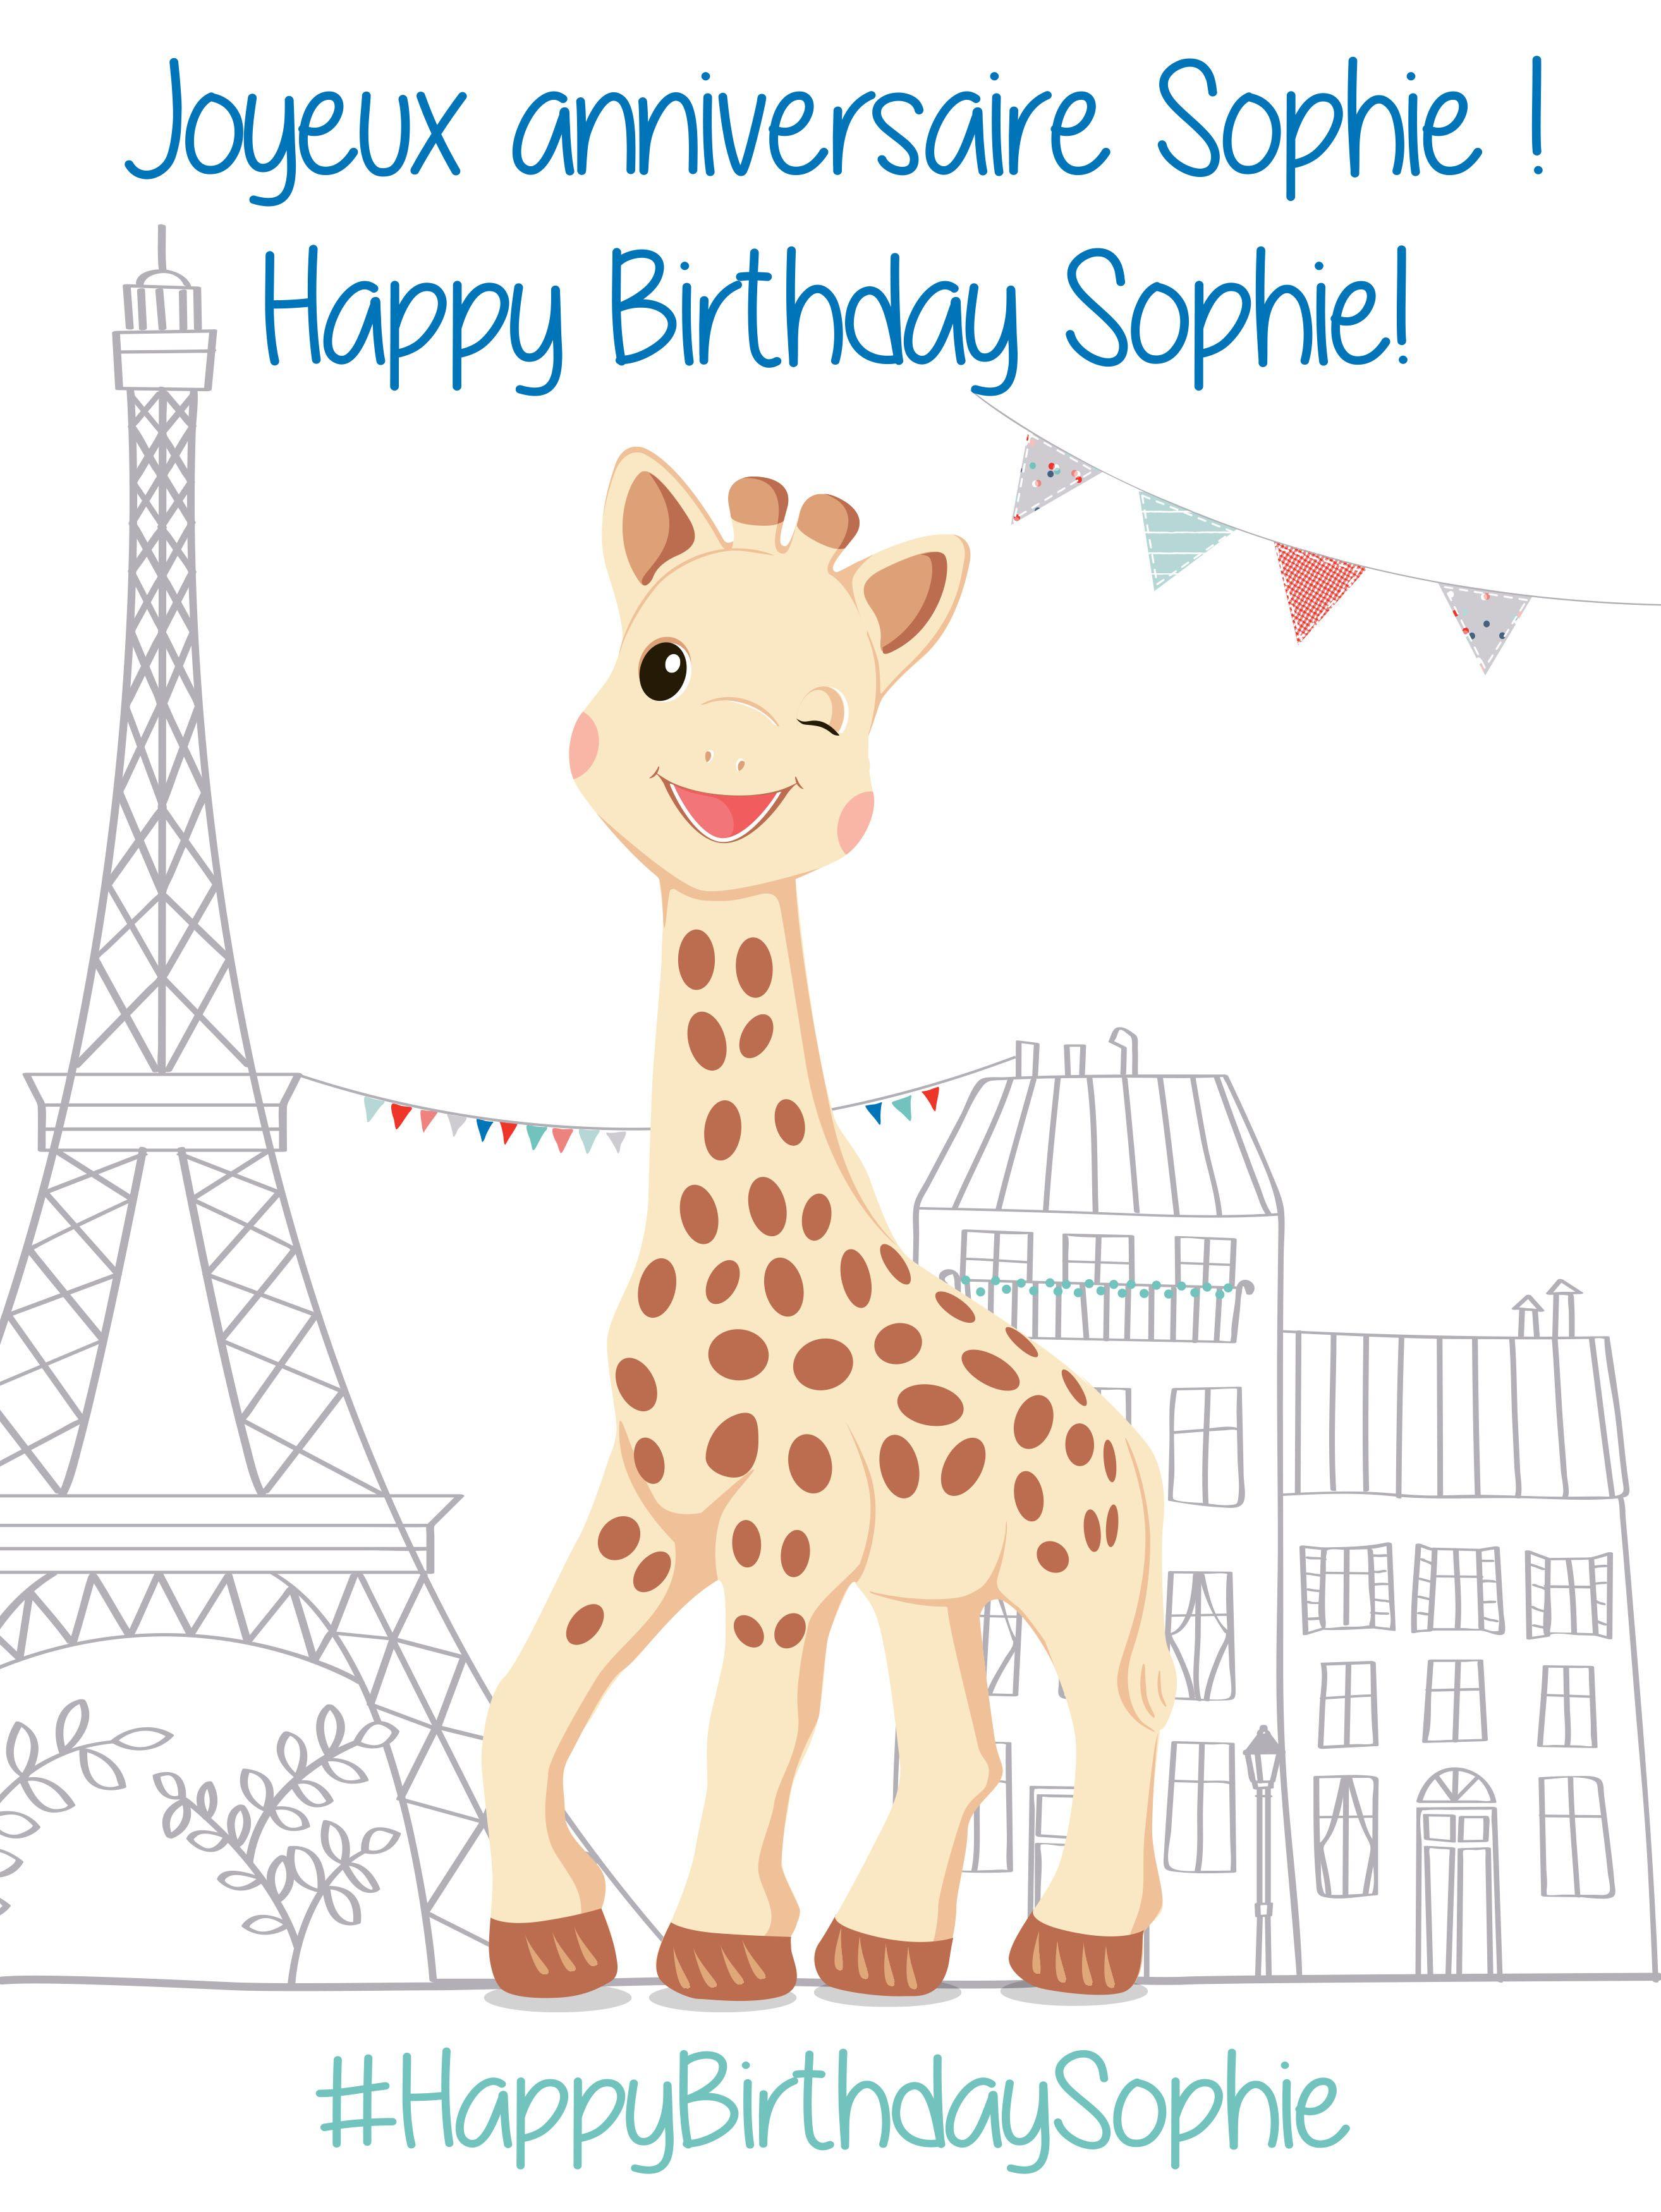 Happybirthdaysophie 54 Anniversary Sophie La Girafe En